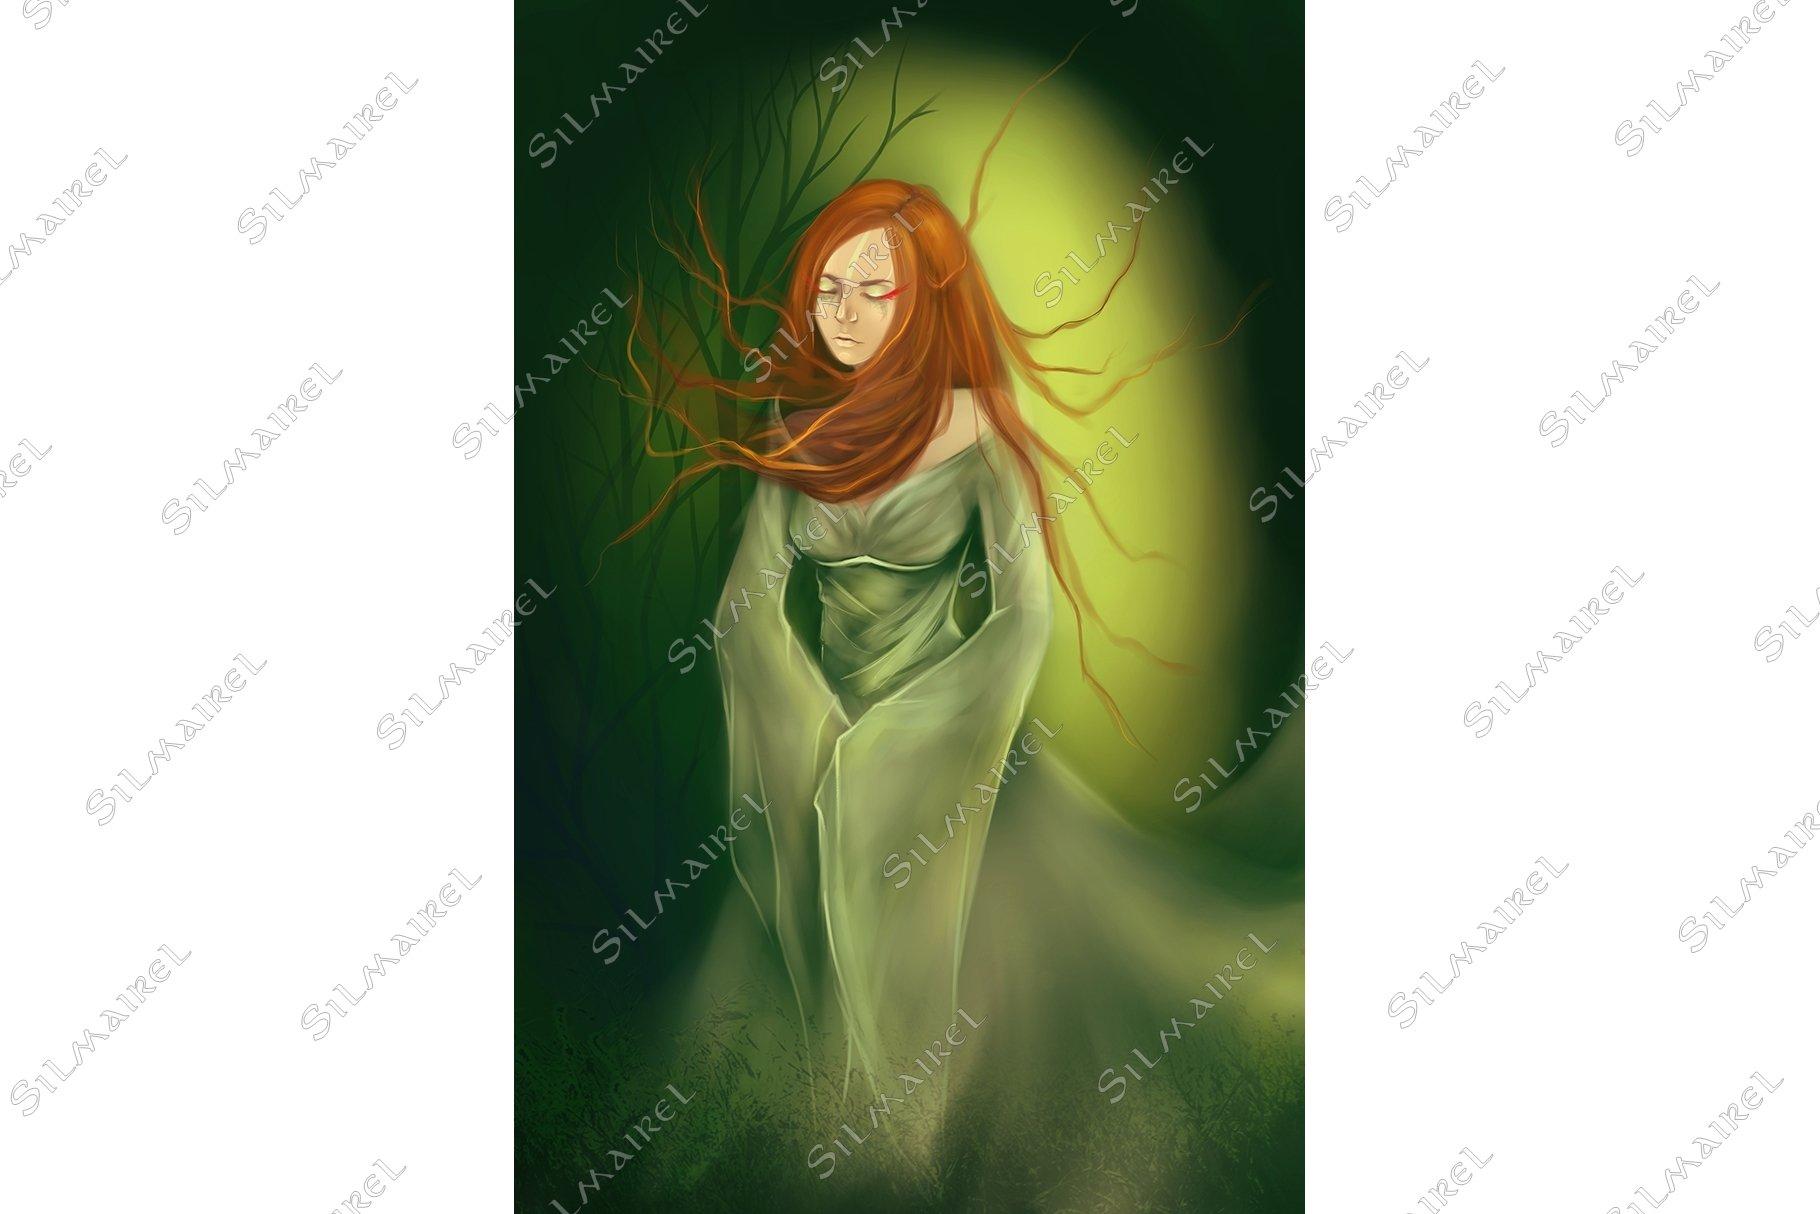 Ginger girl green dress wood forest digital art example image 1